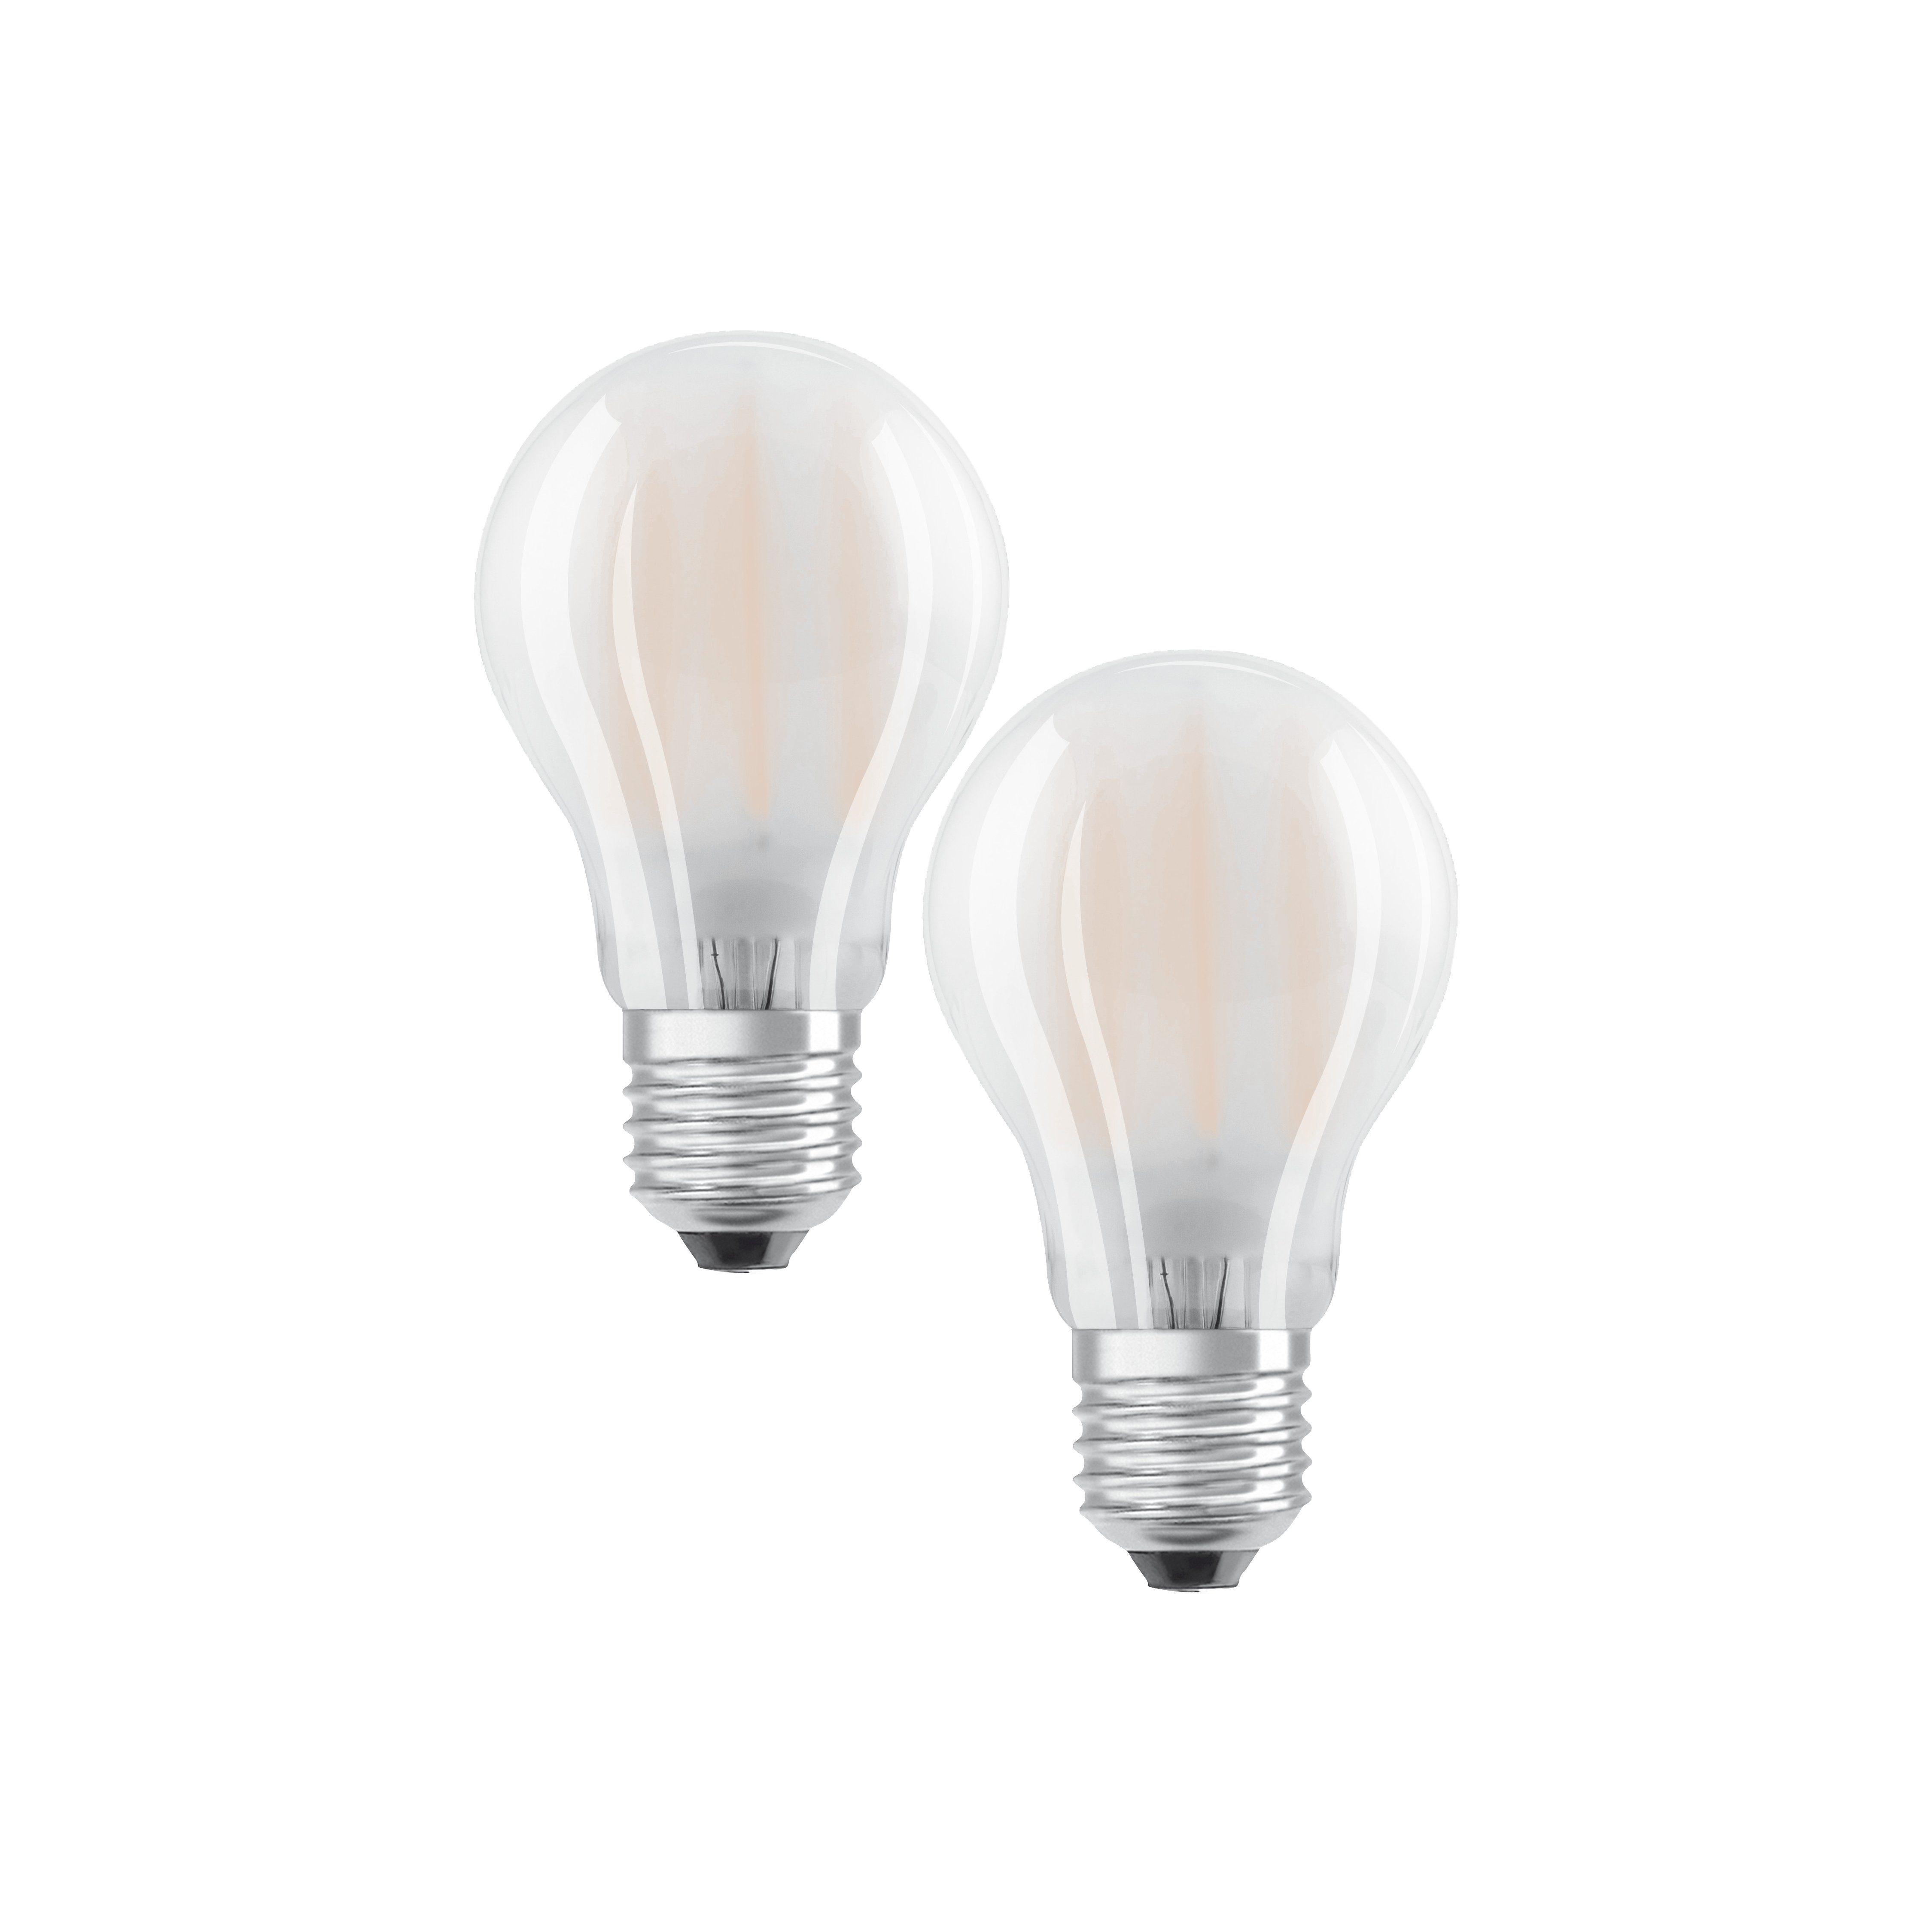 Osram Set: 2 x LED Retrofit Classic LED-Lampe »ST CLAS A 60 FR 7 W/827 E27«